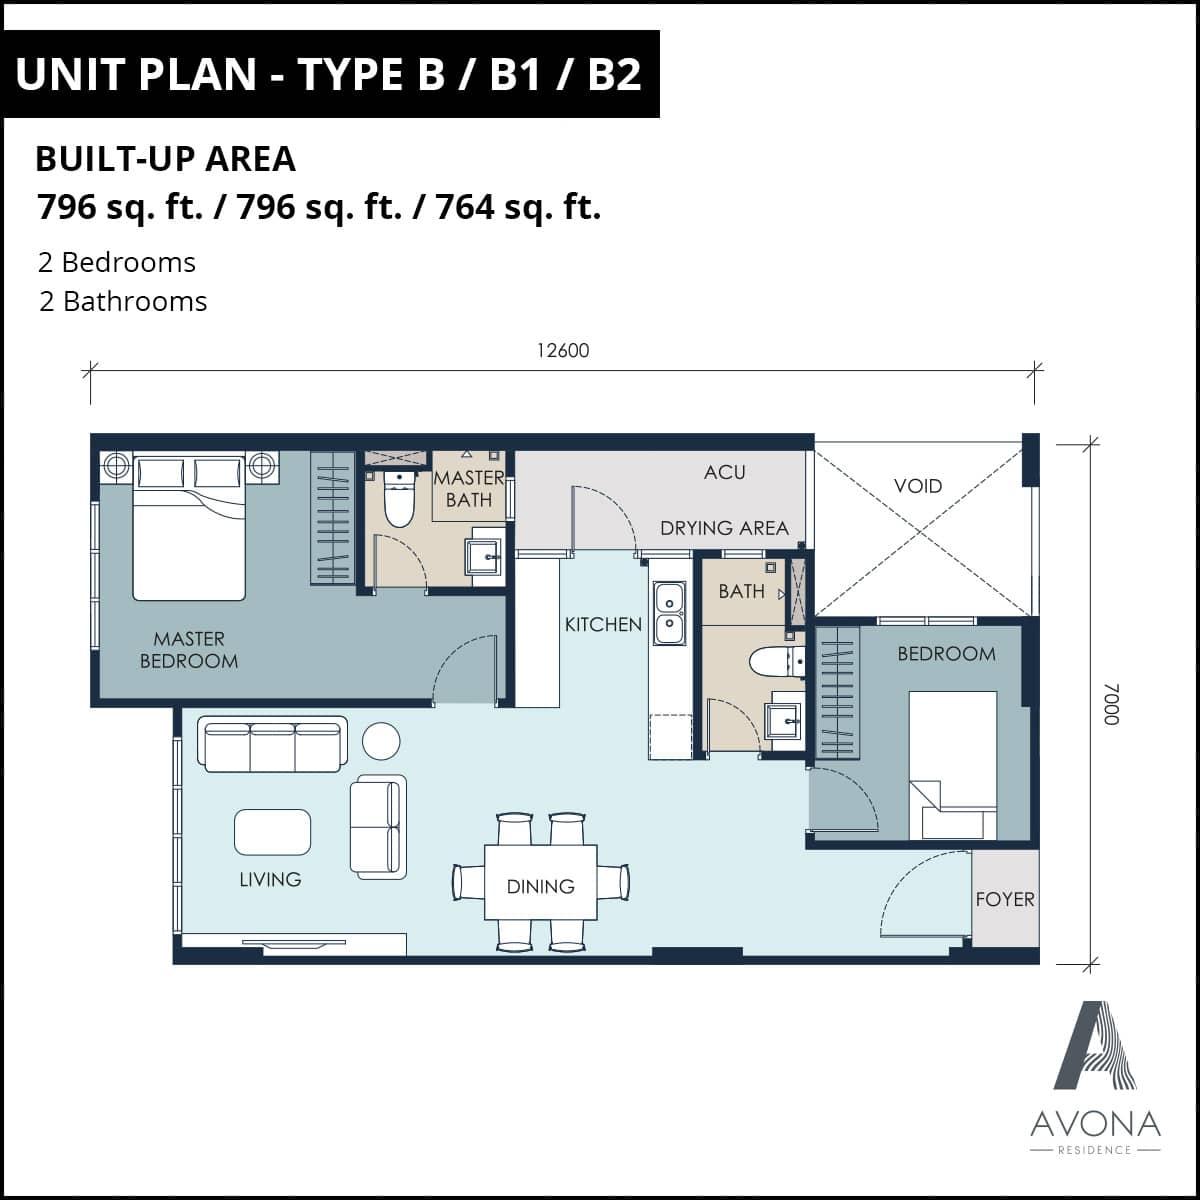 Type B Unit Plan